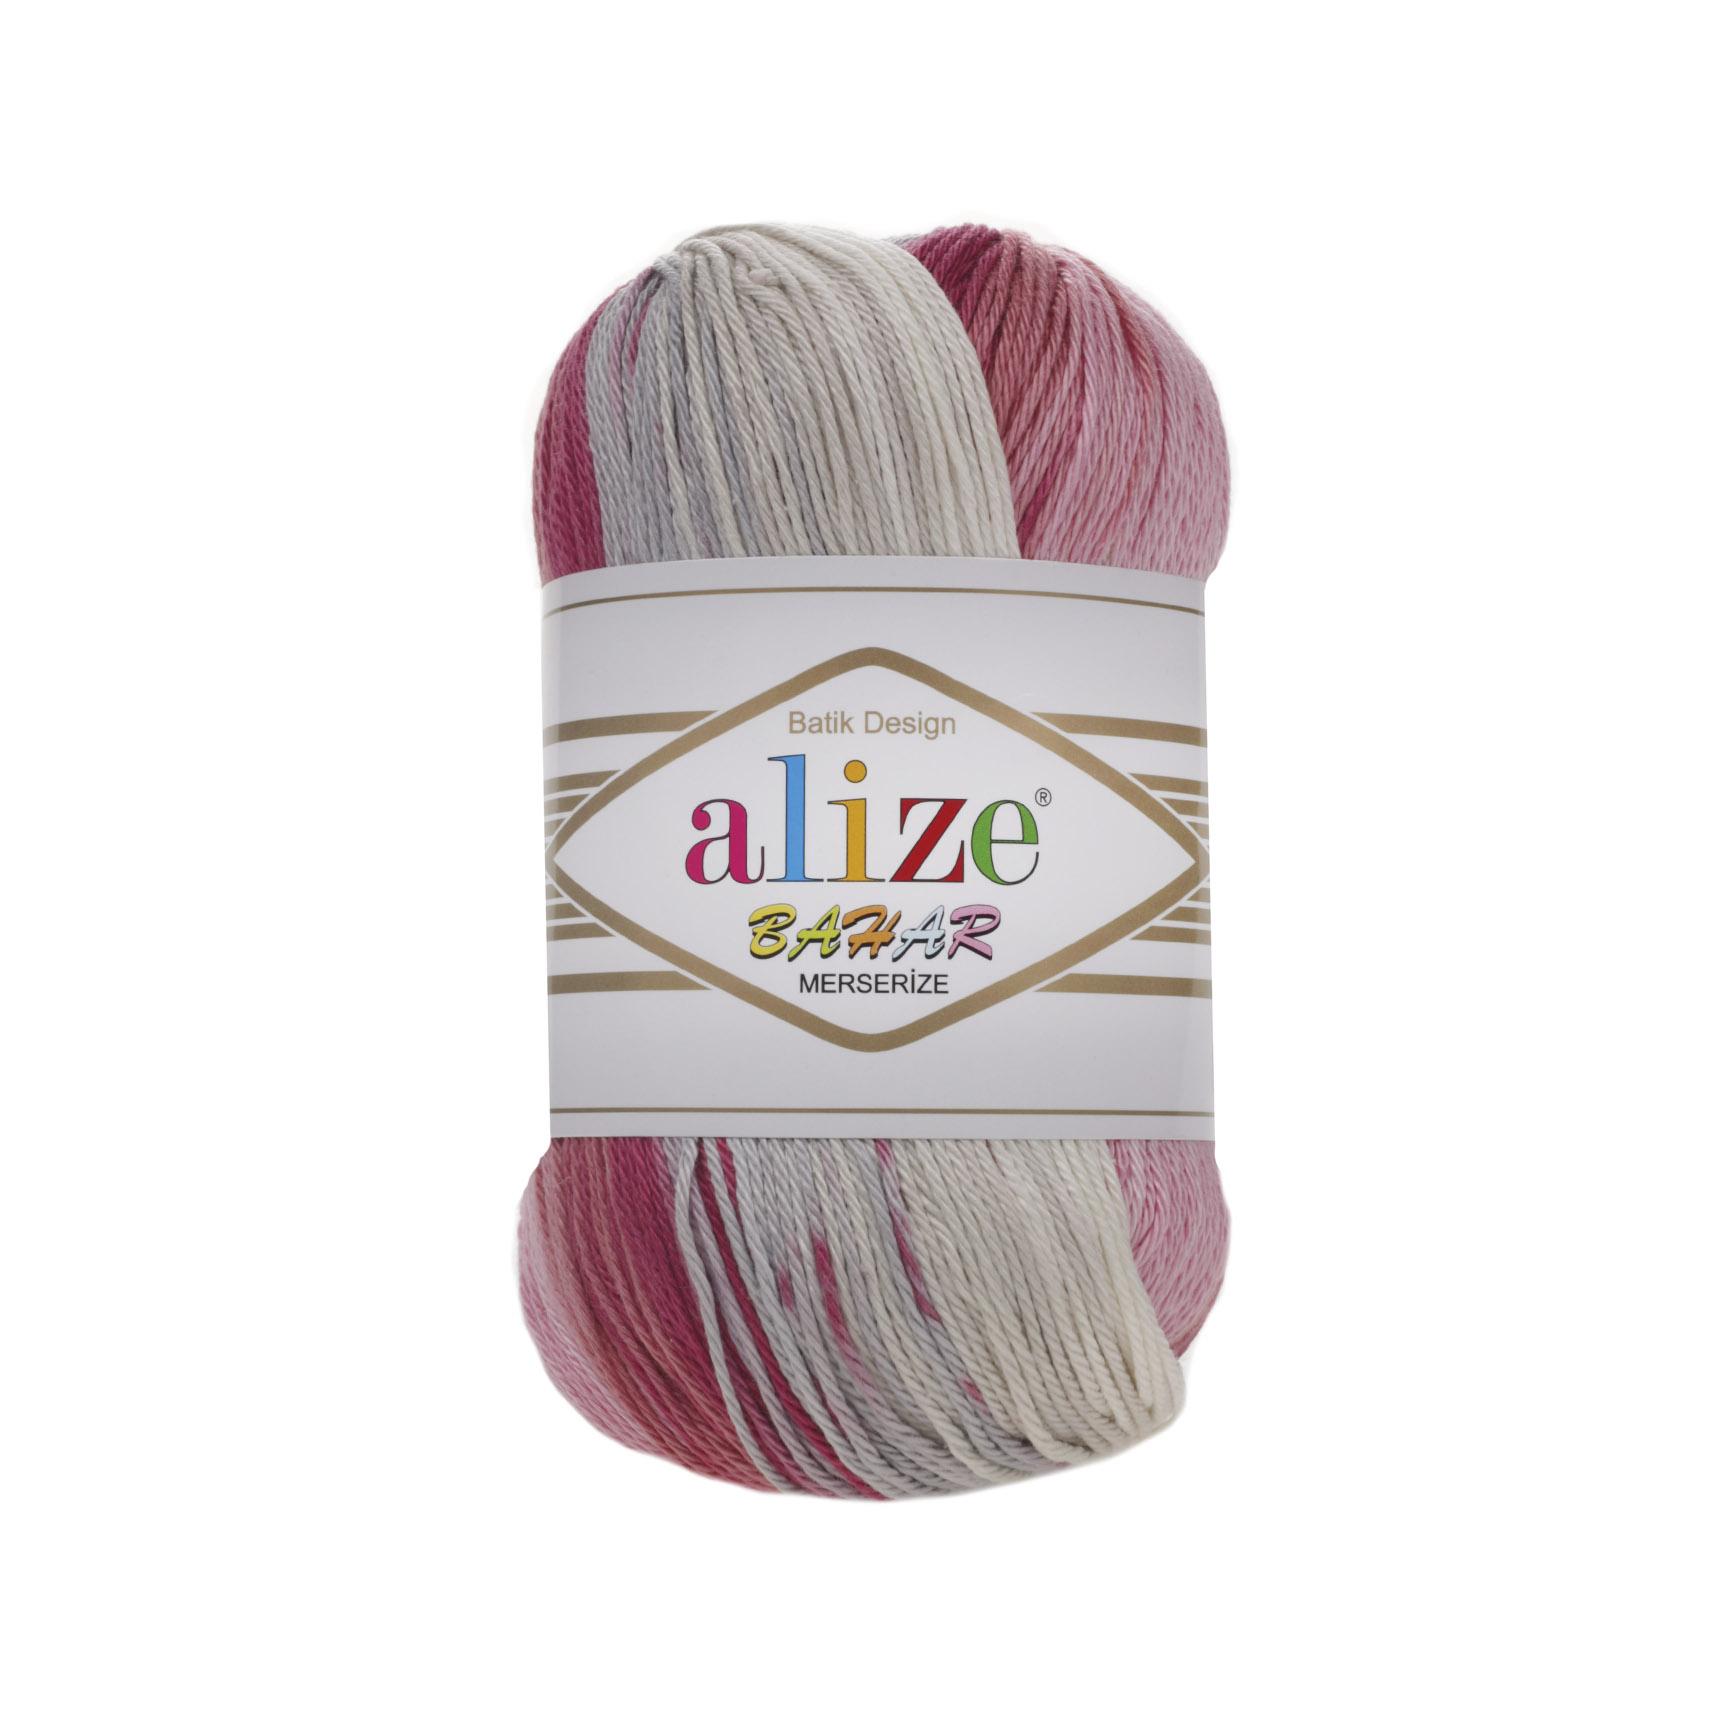 Alize Bahar Batik Design Cod 5512-0